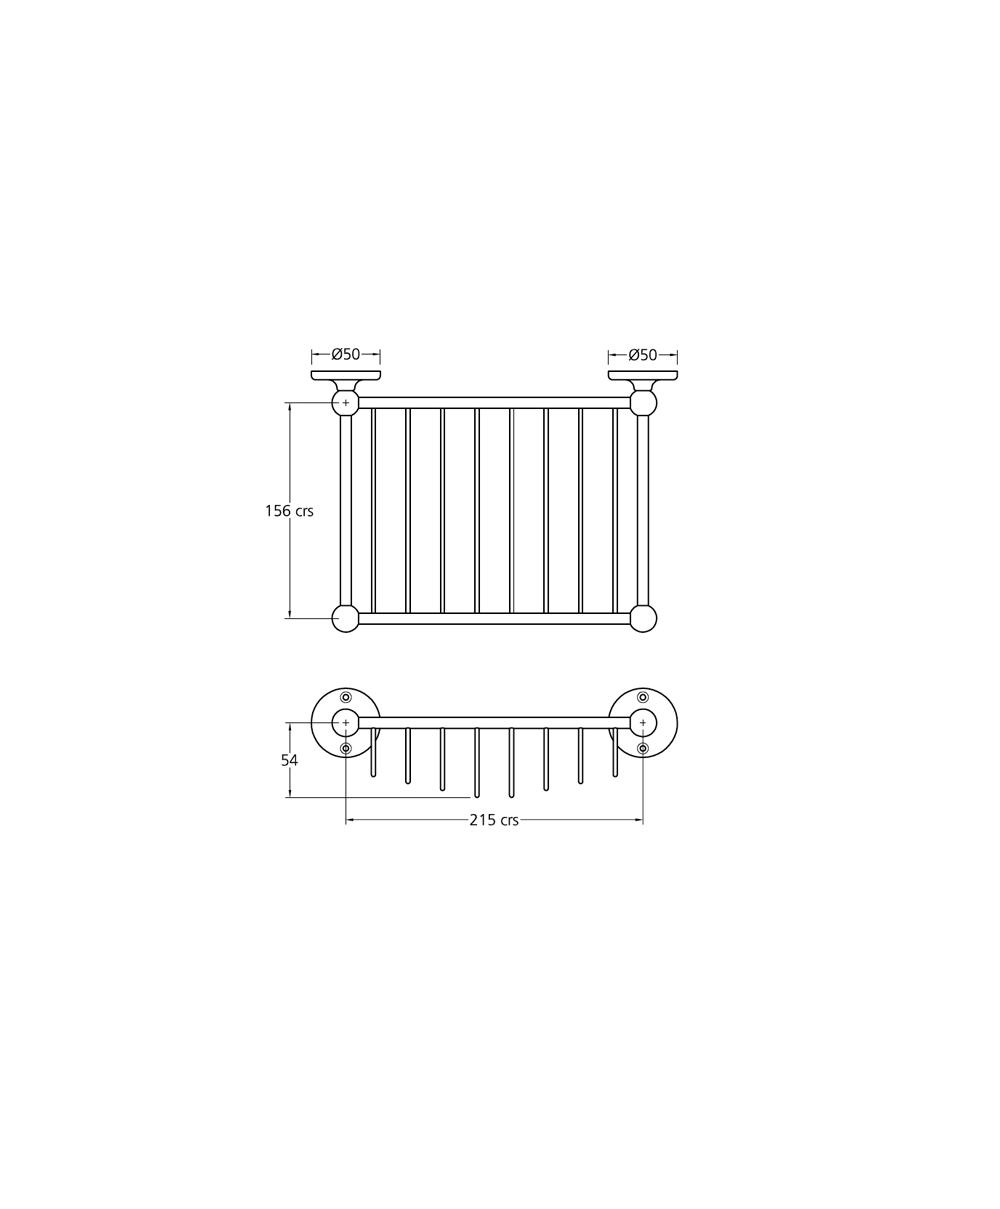 Lefroy Brooks Edwardian Wire Sponge Dish Lb4950 Wiring Diagram